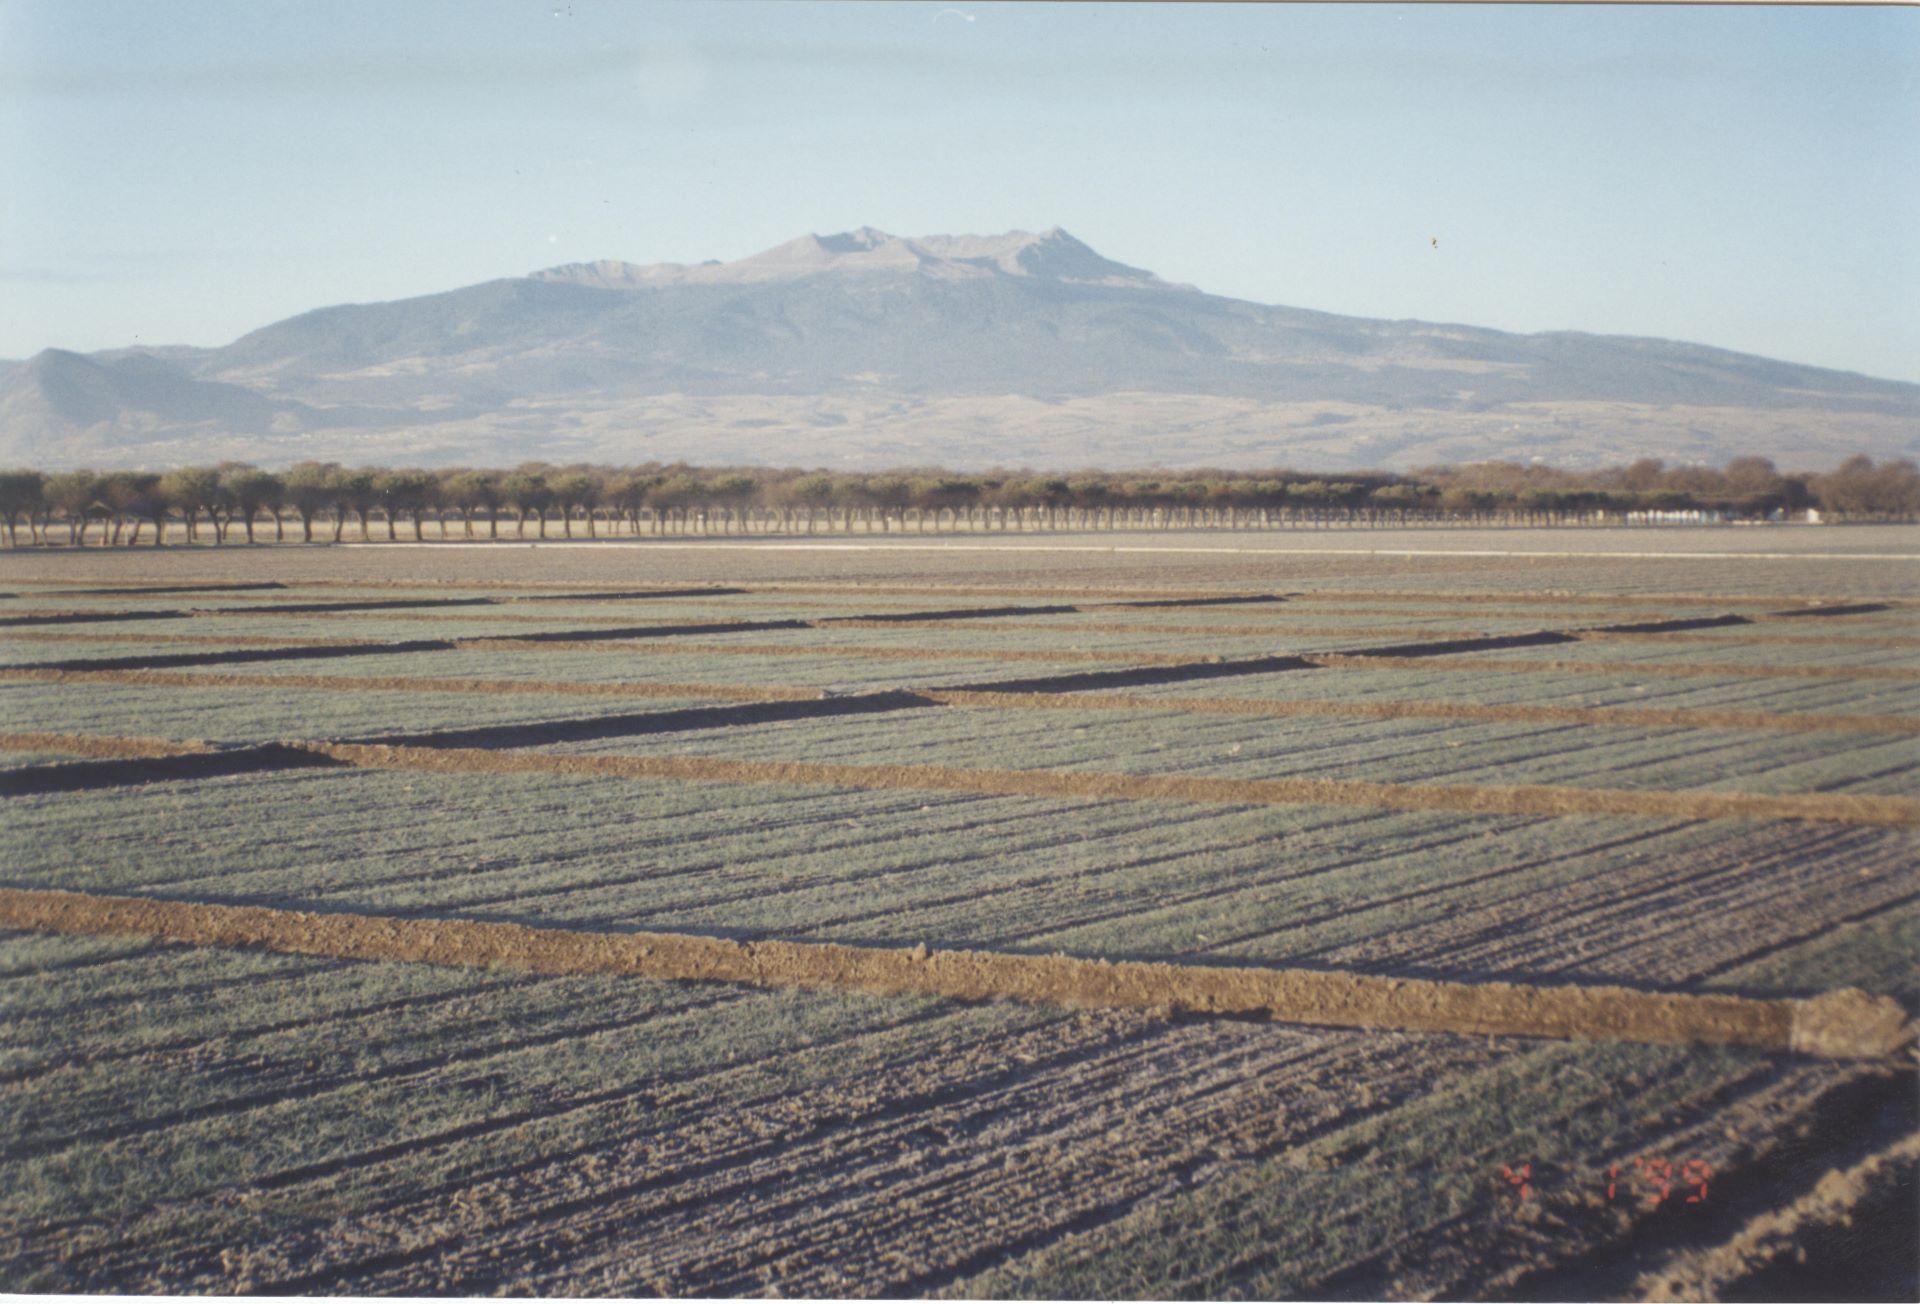 Wheat fields at Toluca station. Nevado de Toluca features in the background. (Photo: Fernando Delgado/CIMMYT)